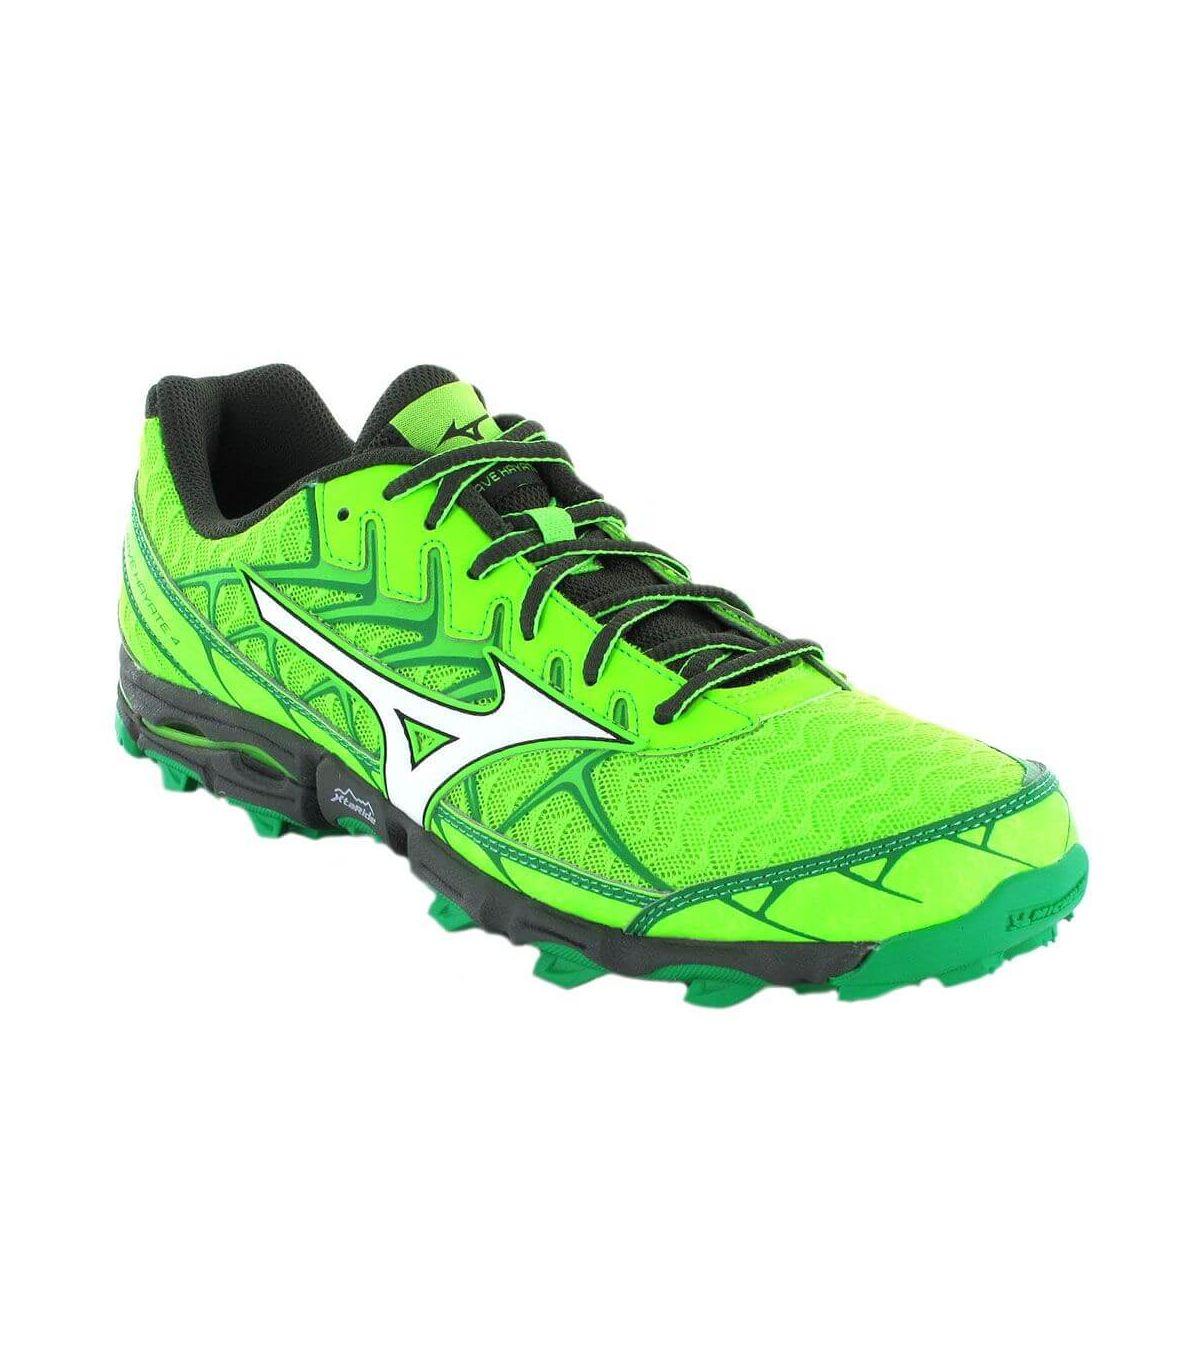 Mizuno Wave Hayate 4 Mizuno Zapatillas Trail Running Hombre Zapatillas Trail Running Tallas: 44, 46; Color: pistacho